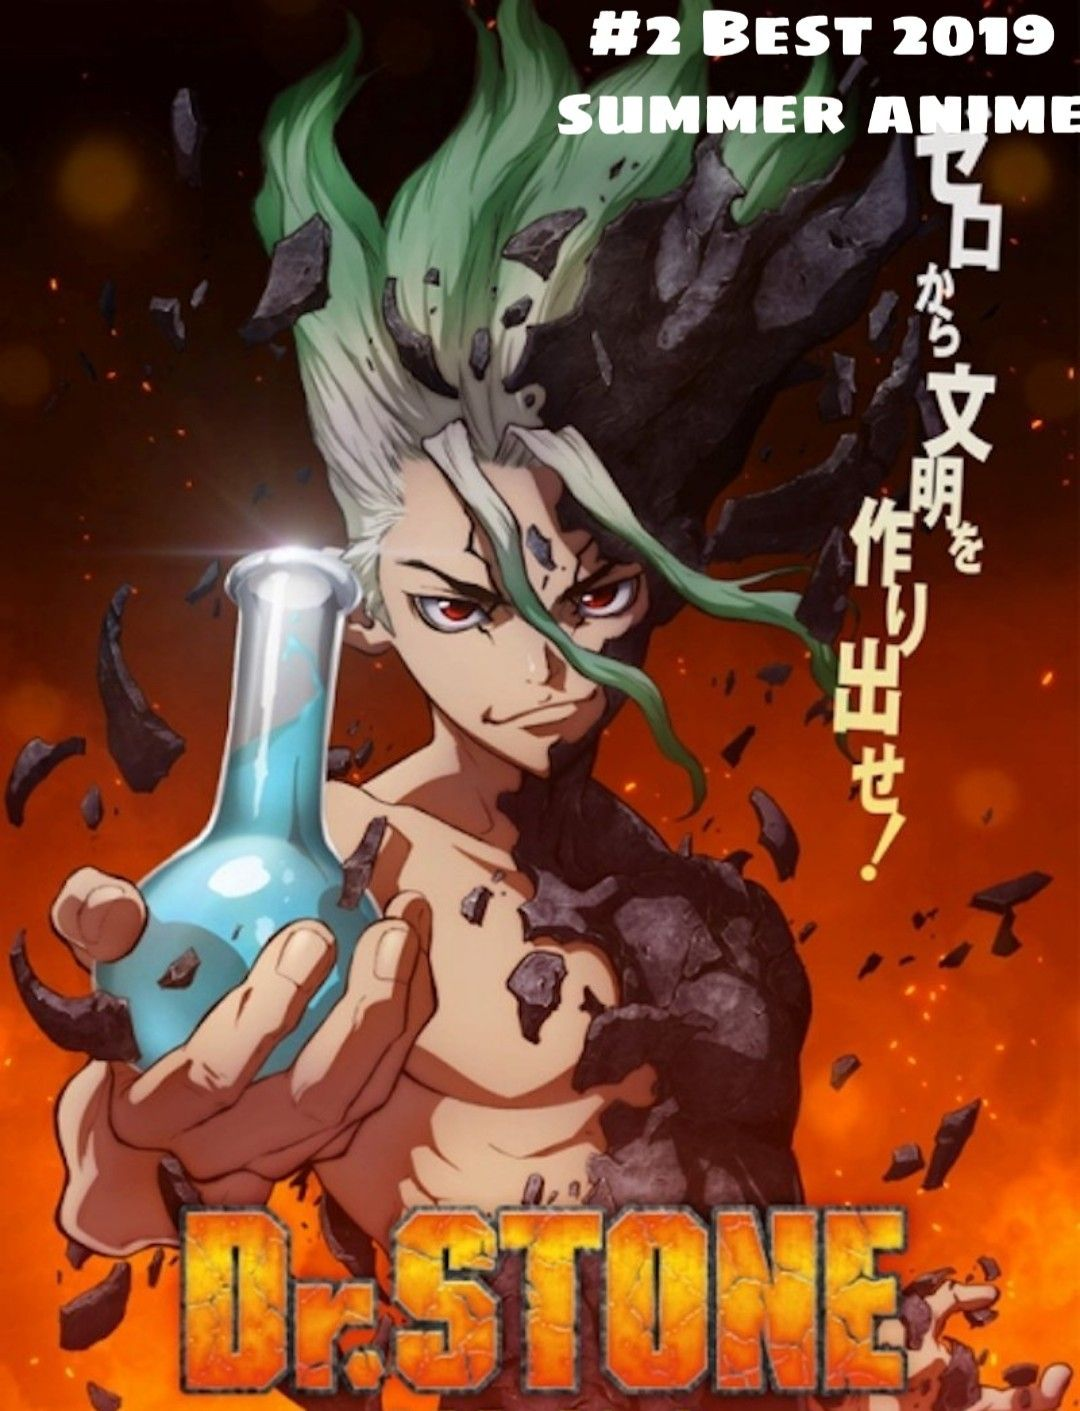 Dr stone, dr stone senkuu, dr stone anime, 2 best summer